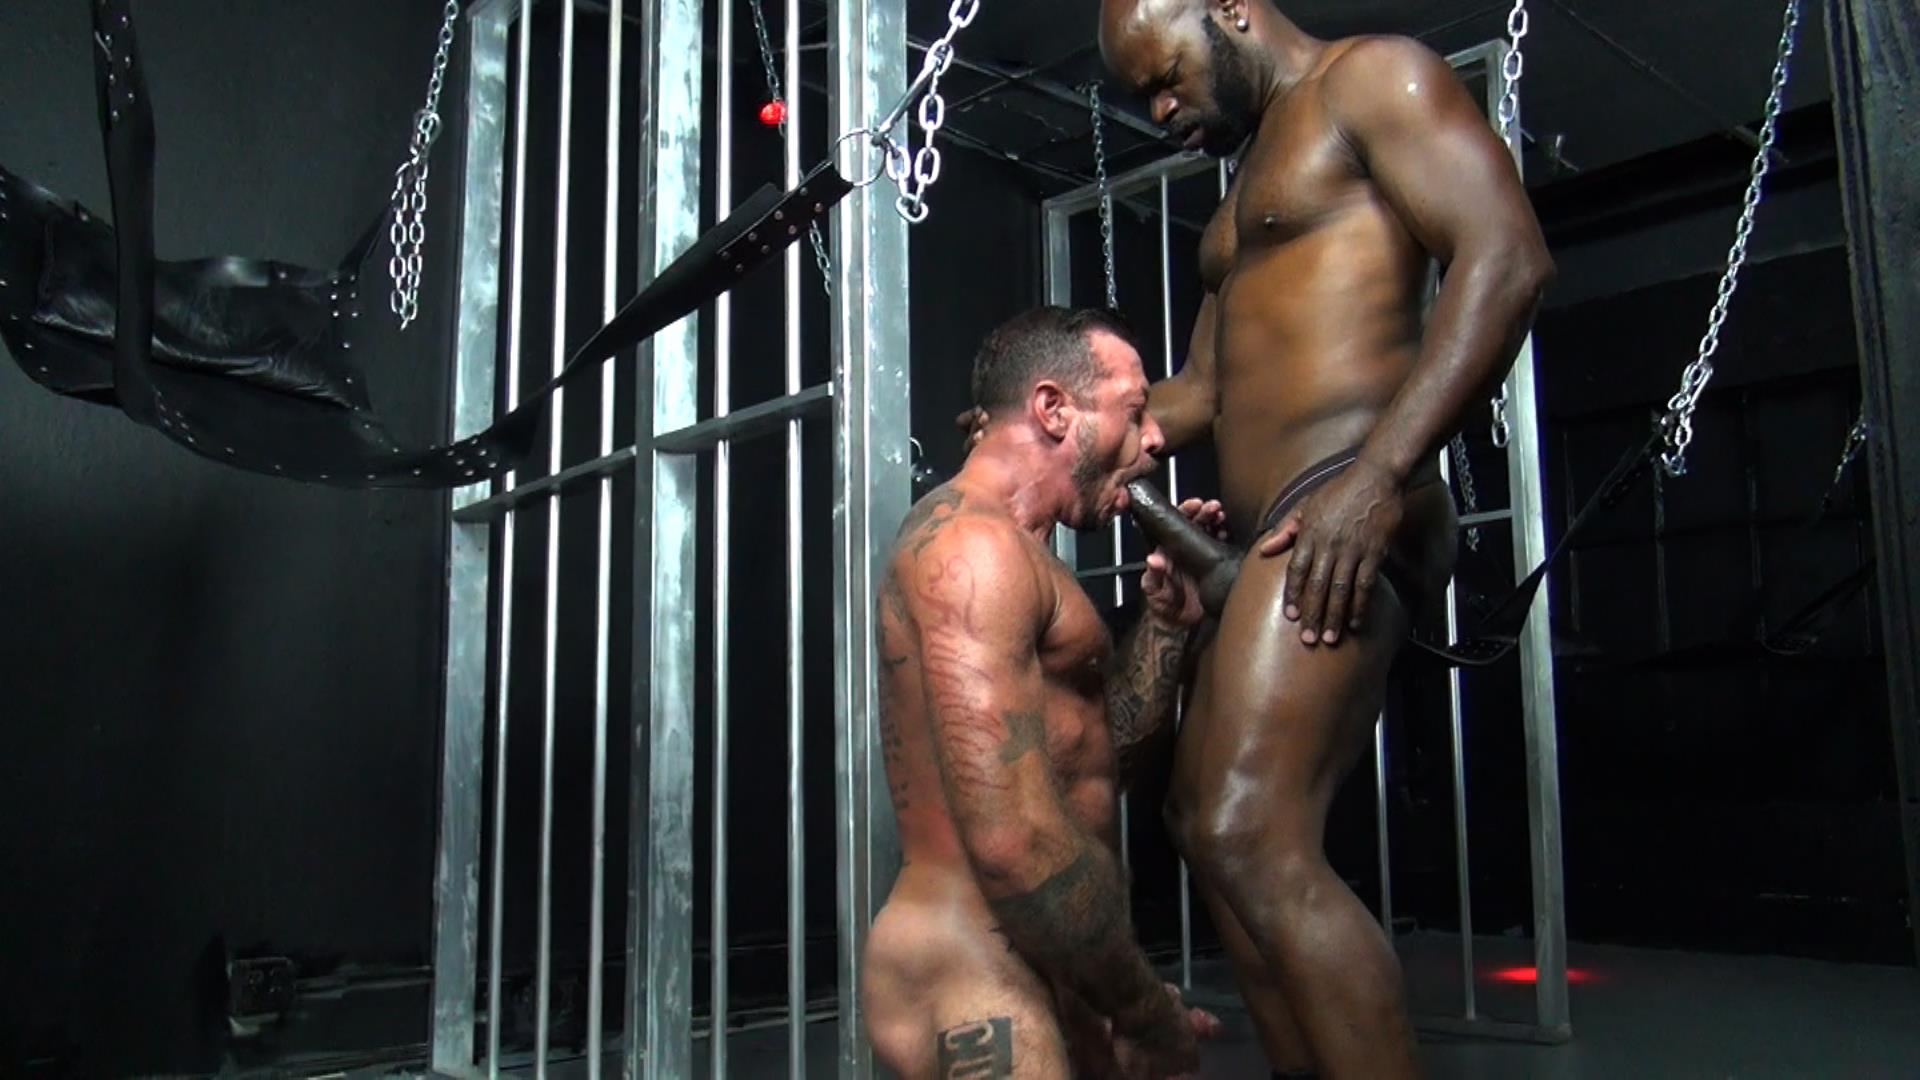 Raw Fuck Club Cutler X and Ray Dalton Interracial Bareback Sex Amateur Gay Porn 4 Cutler X Barebacking Hairy Muscle Daddy Ray Dalton With His Big Black Cock